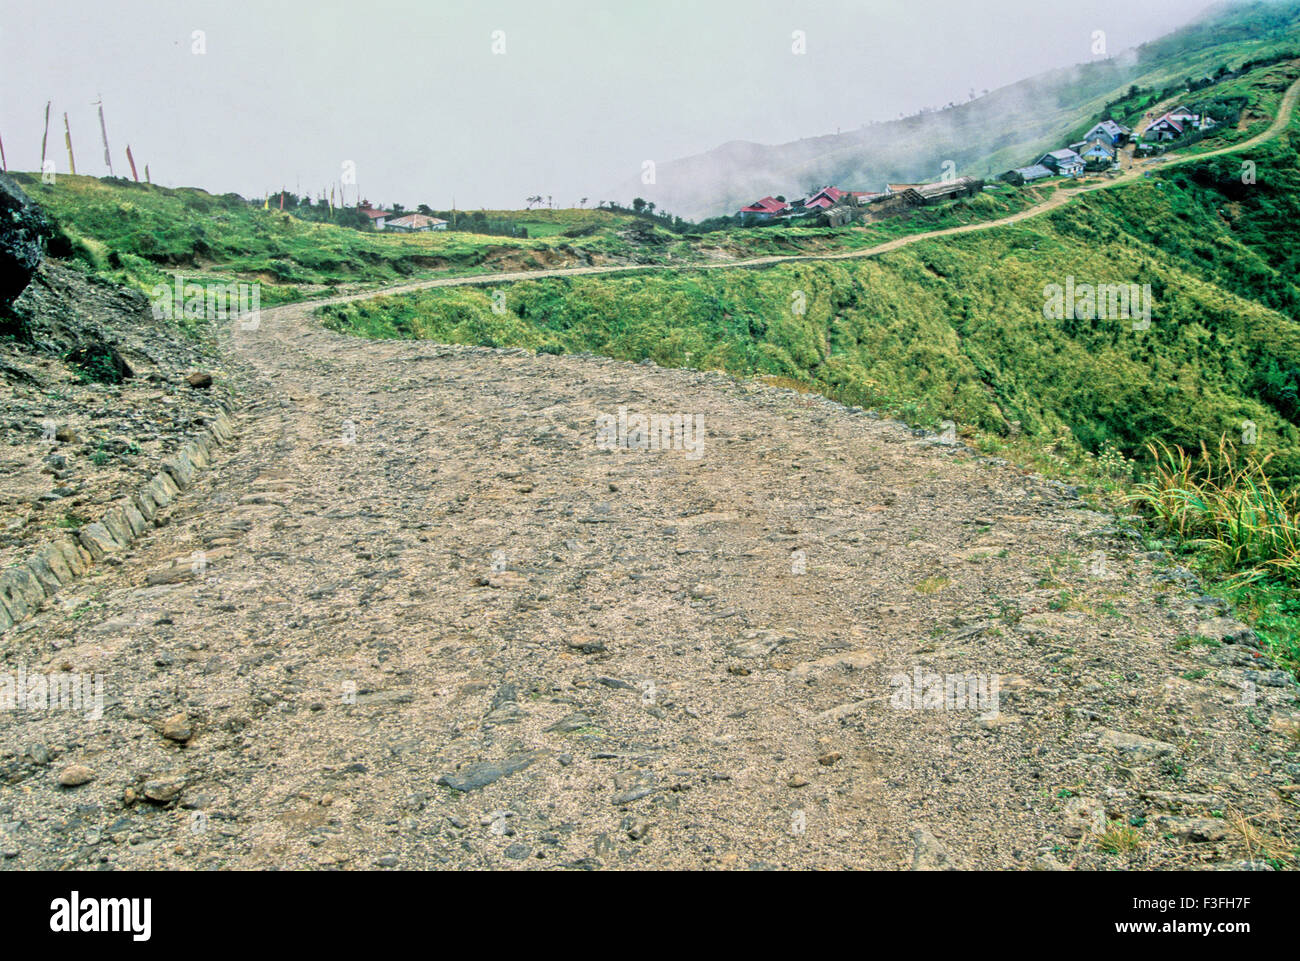 Sandakphu via route de trekking tour; style de vie Darjeeling Darjeeling au Bengale occidental; Inde; Photo Stock